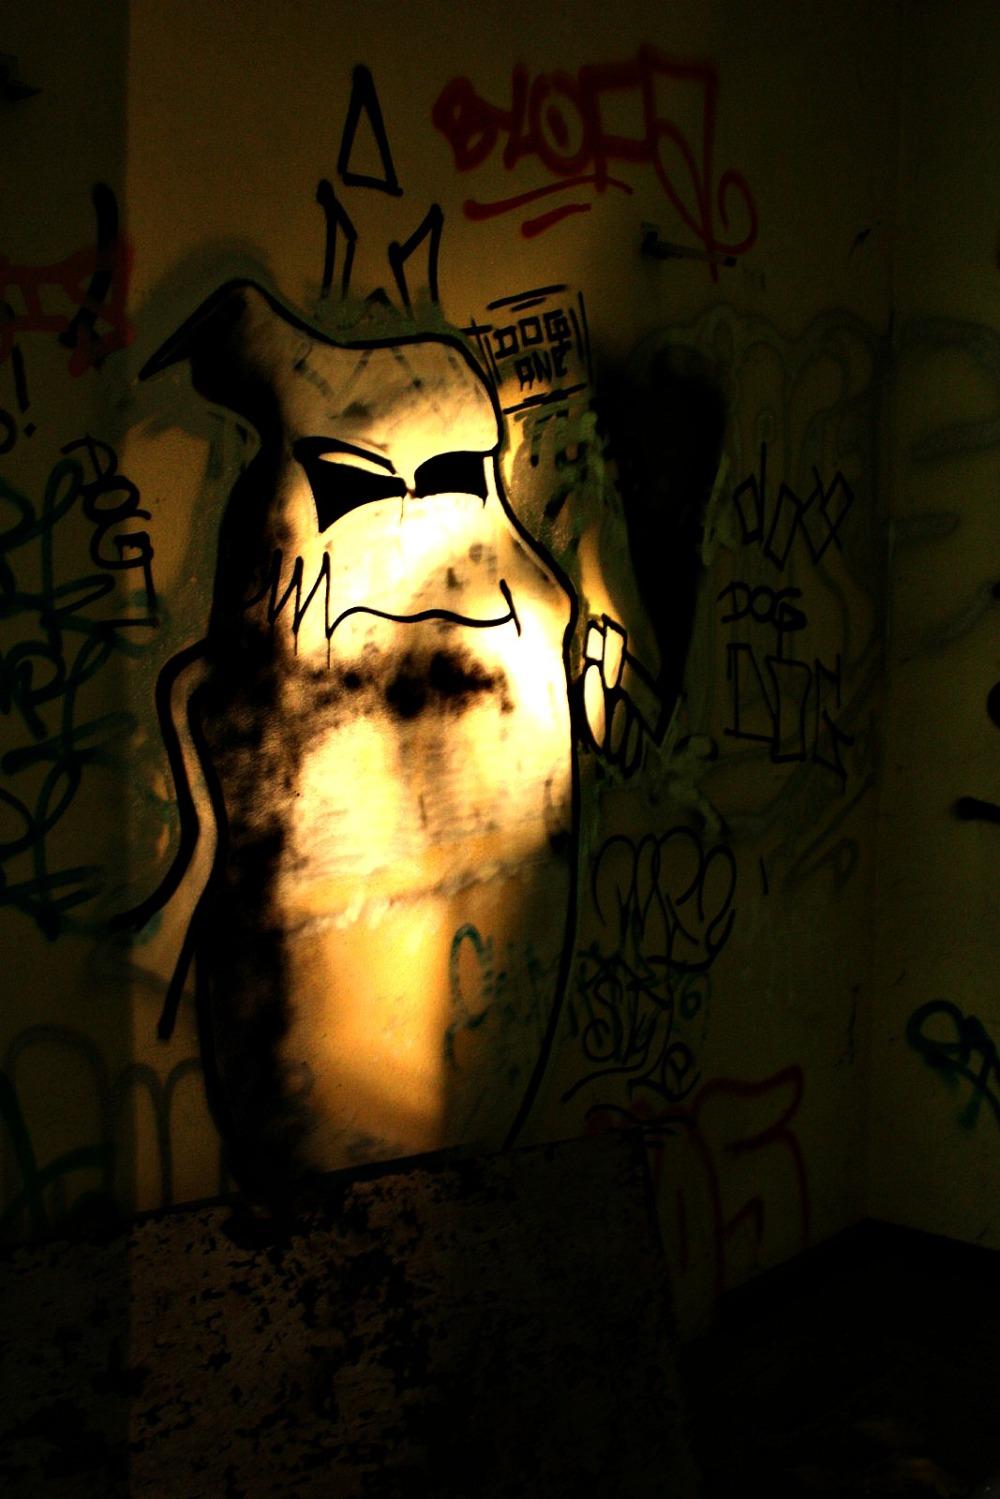 urbex, bretagne, edf, fantôme, exploration,urban